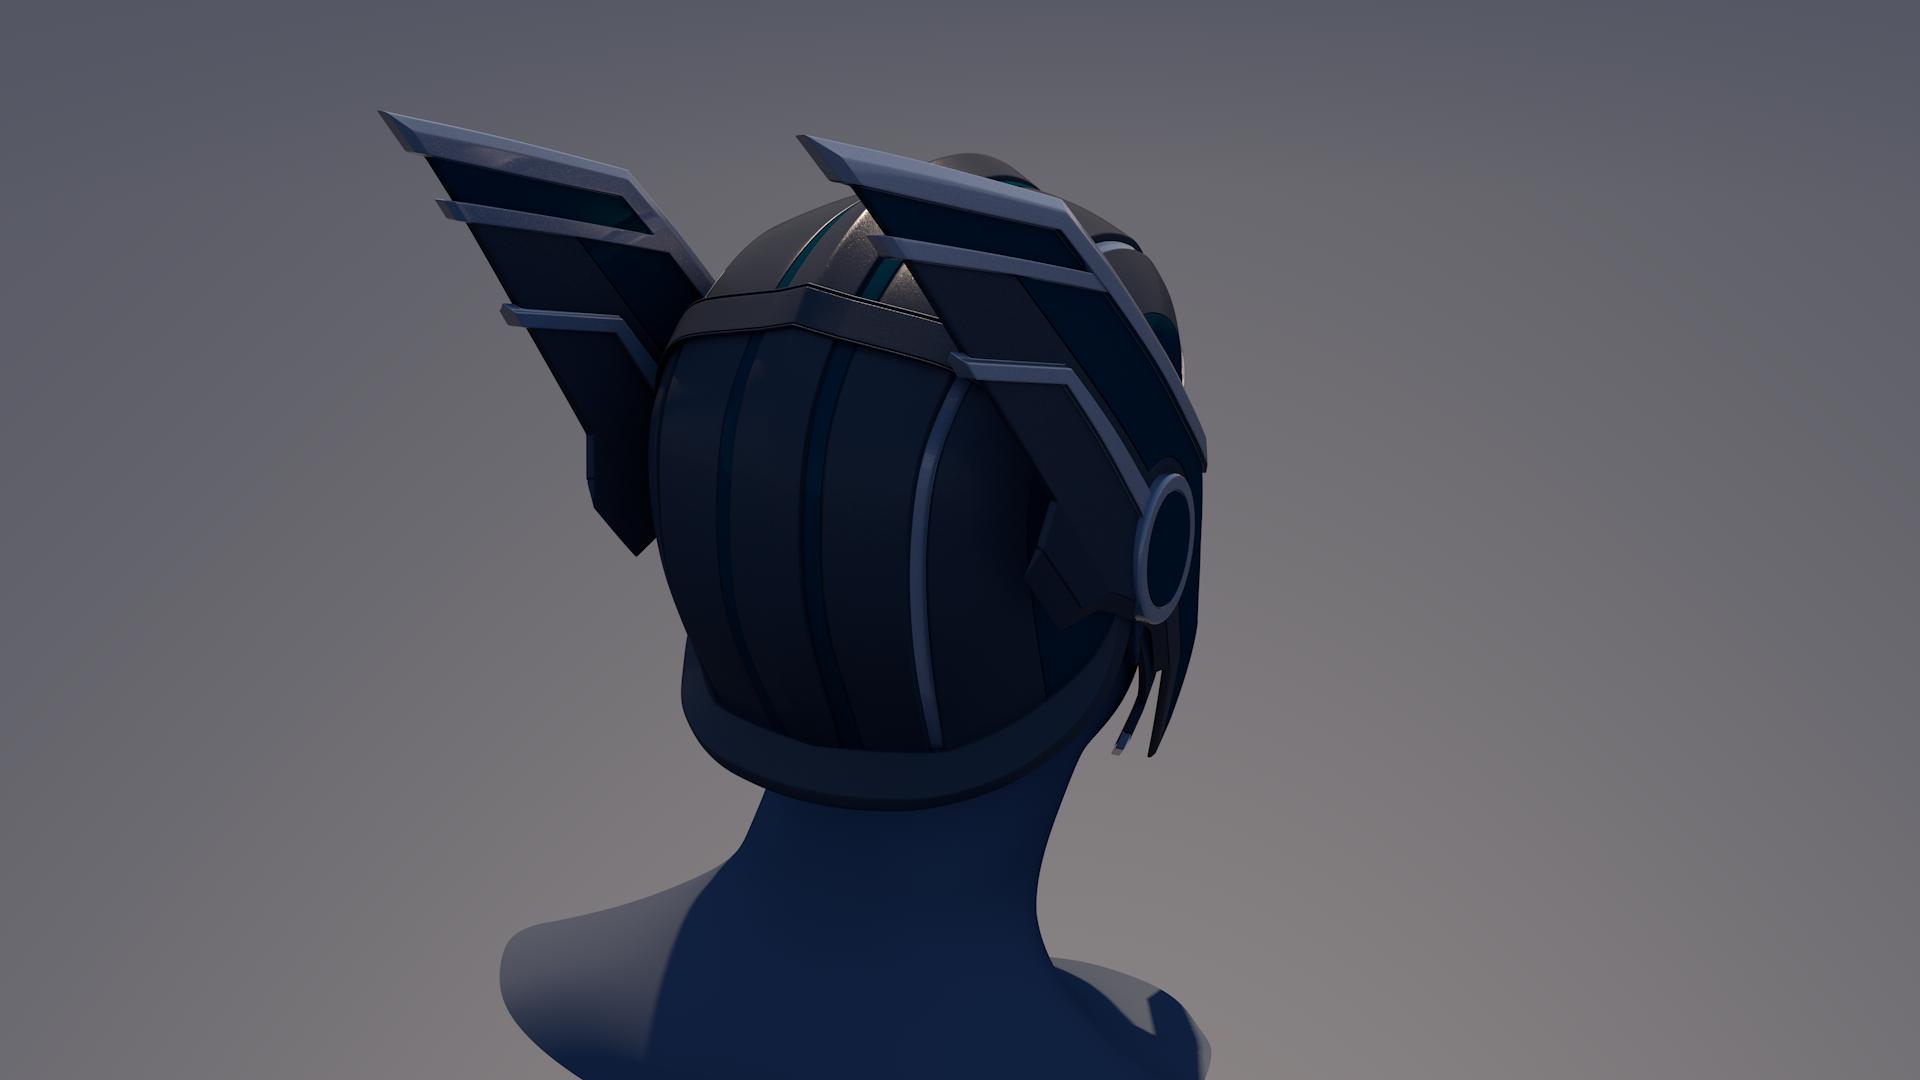 Thor Ragnarok Helmet 2.png Download STL file Thor Ragnarok Helmet • 3D print design, BlackHawk